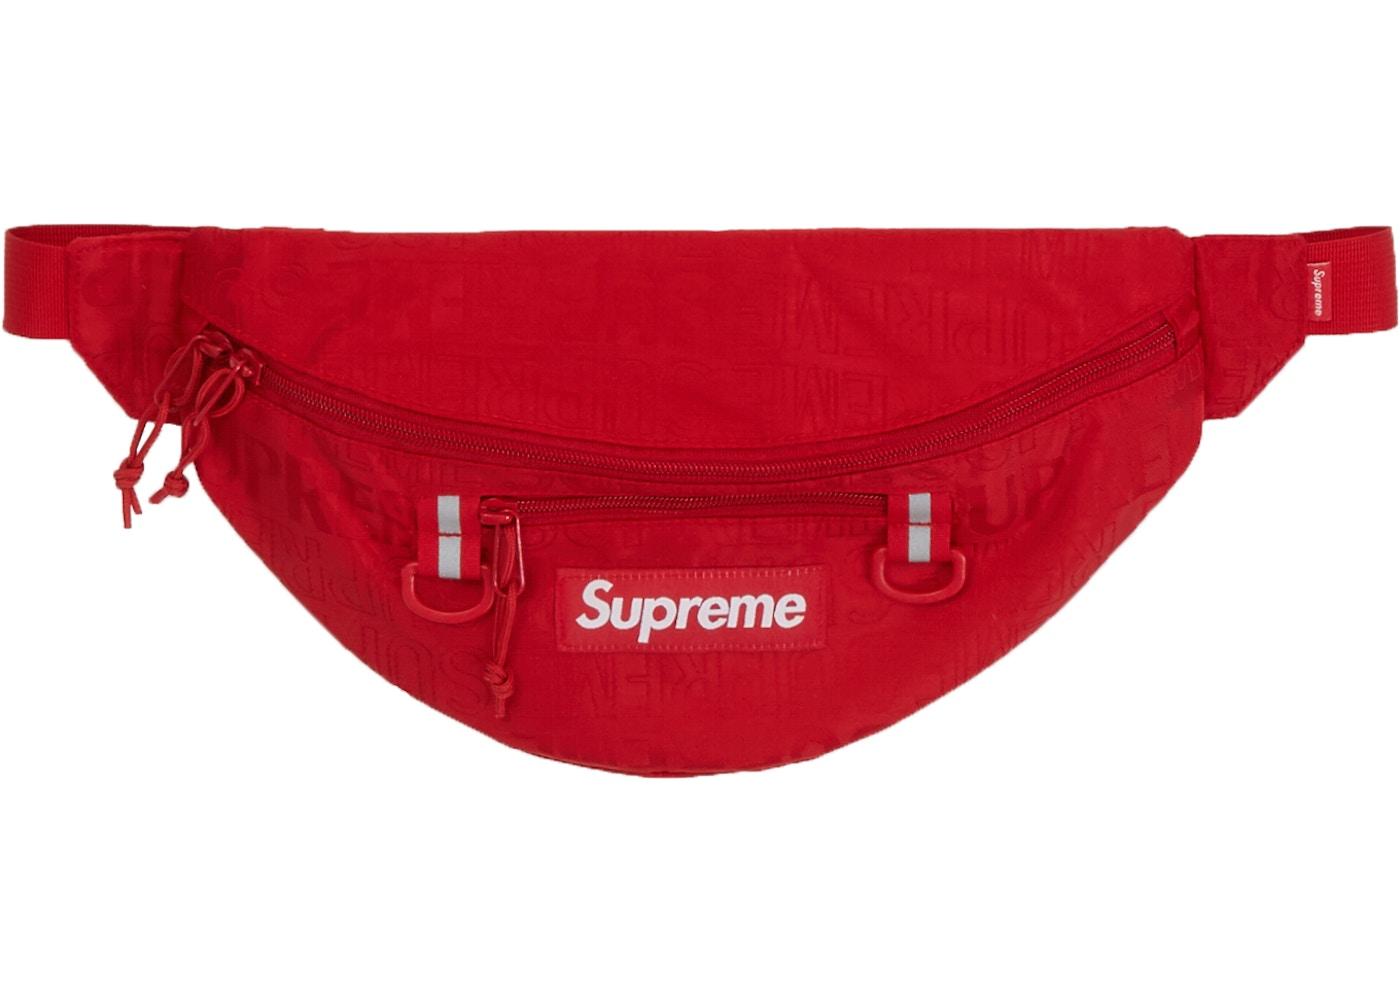 9c5af6ee5e1e Supreme Waist Bag (SS19) Red. Waist